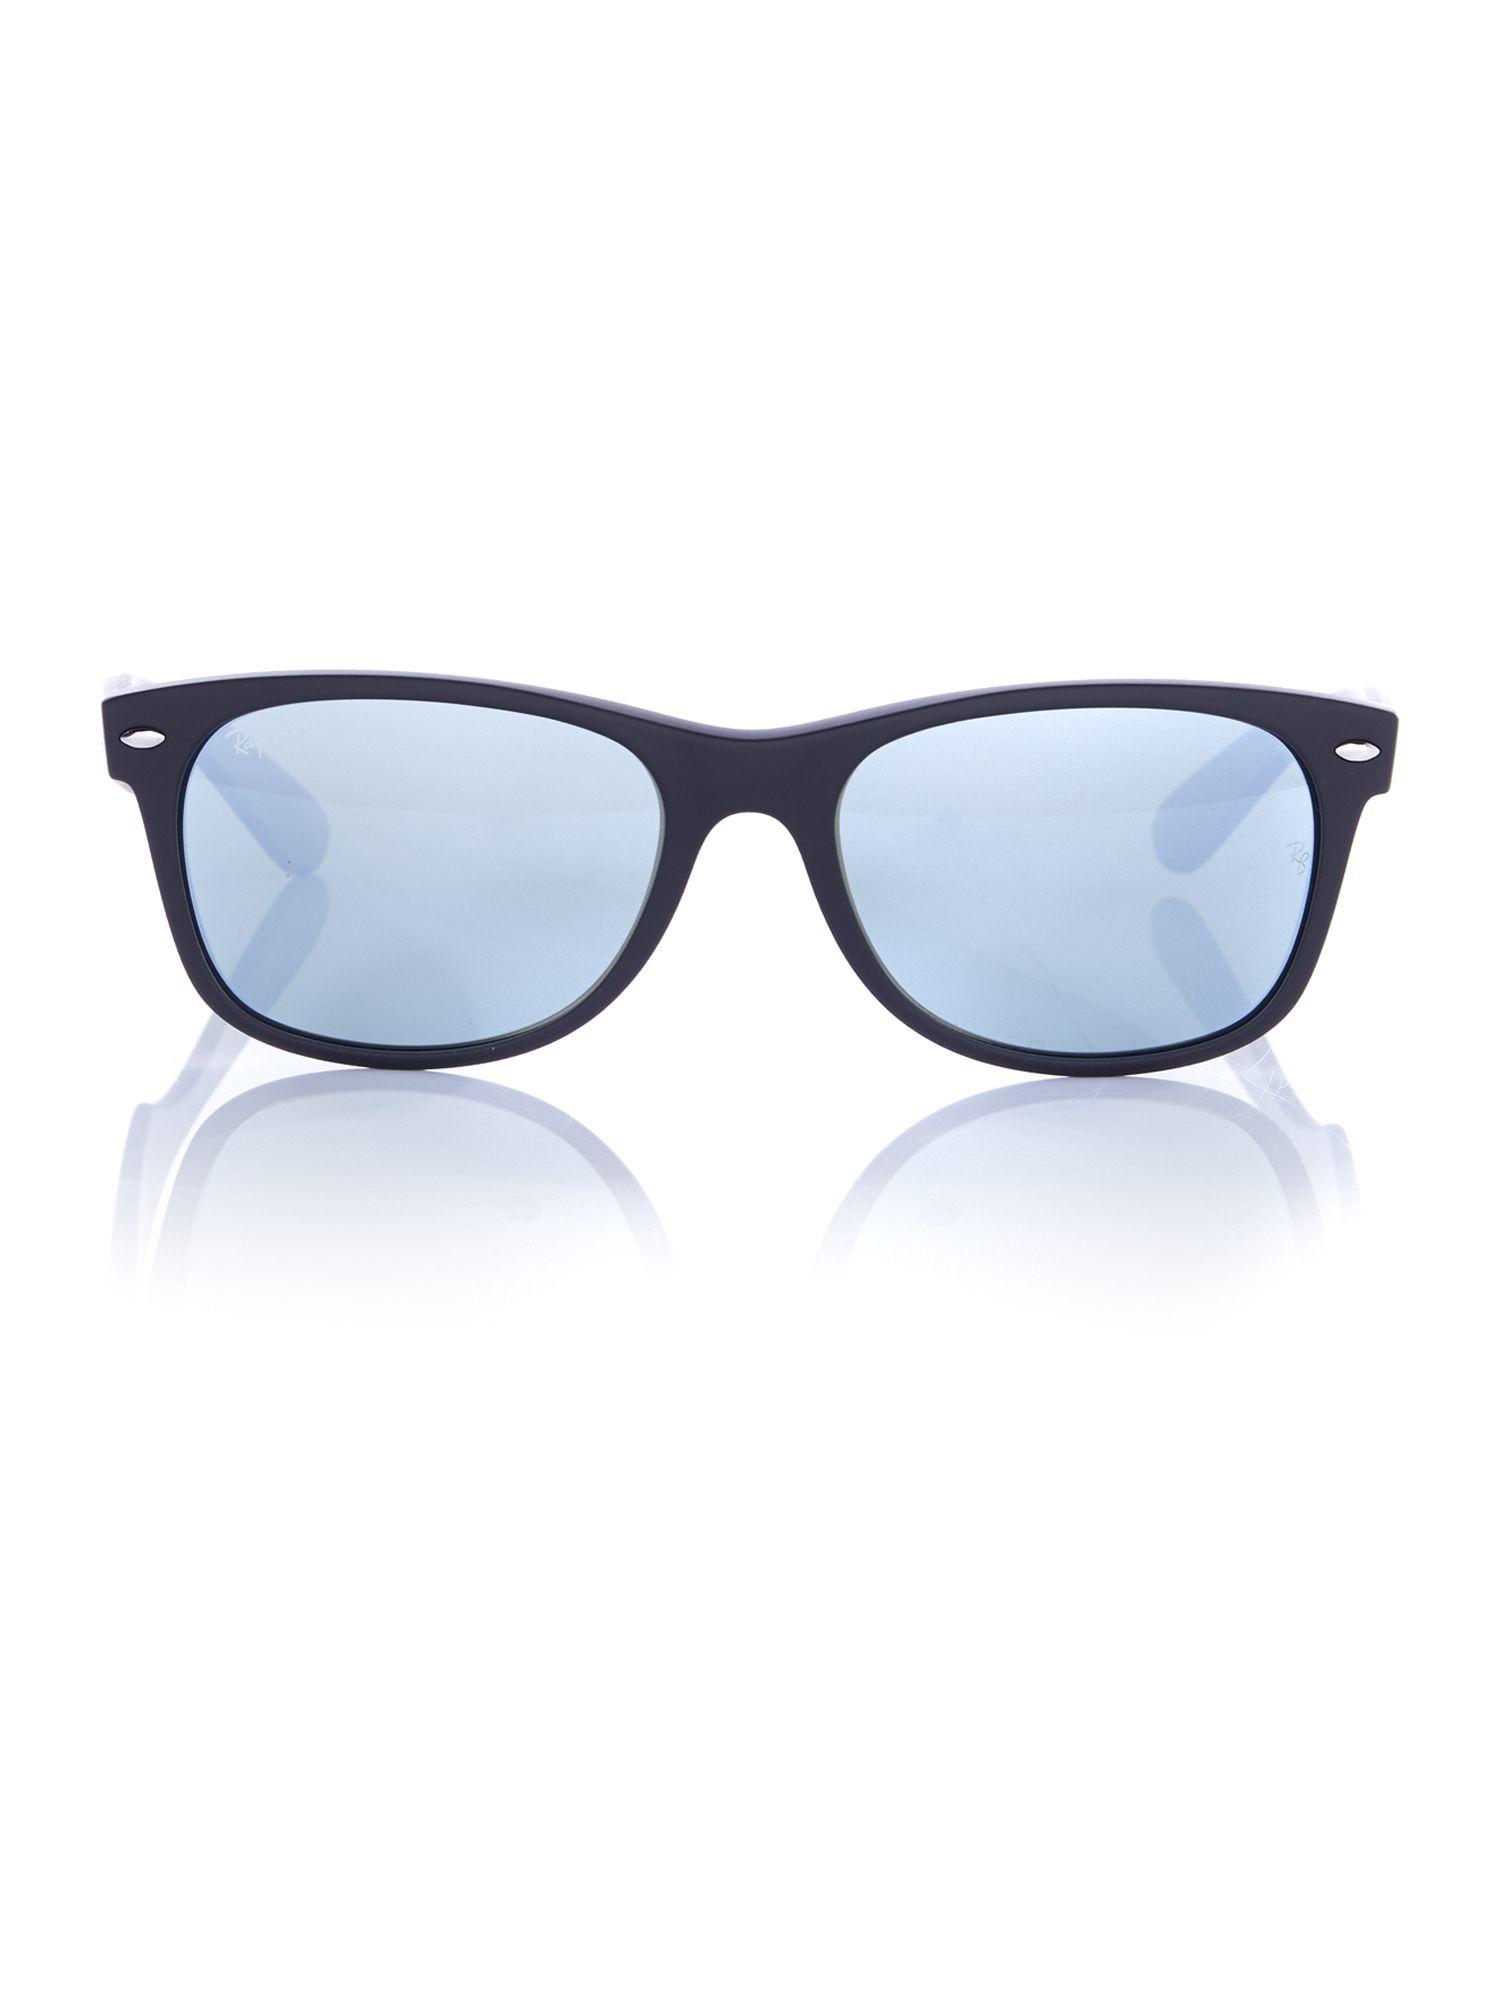 ray ban 0rb2132 new wayfarer sunglasses in blue for men lyst. Black Bedroom Furniture Sets. Home Design Ideas